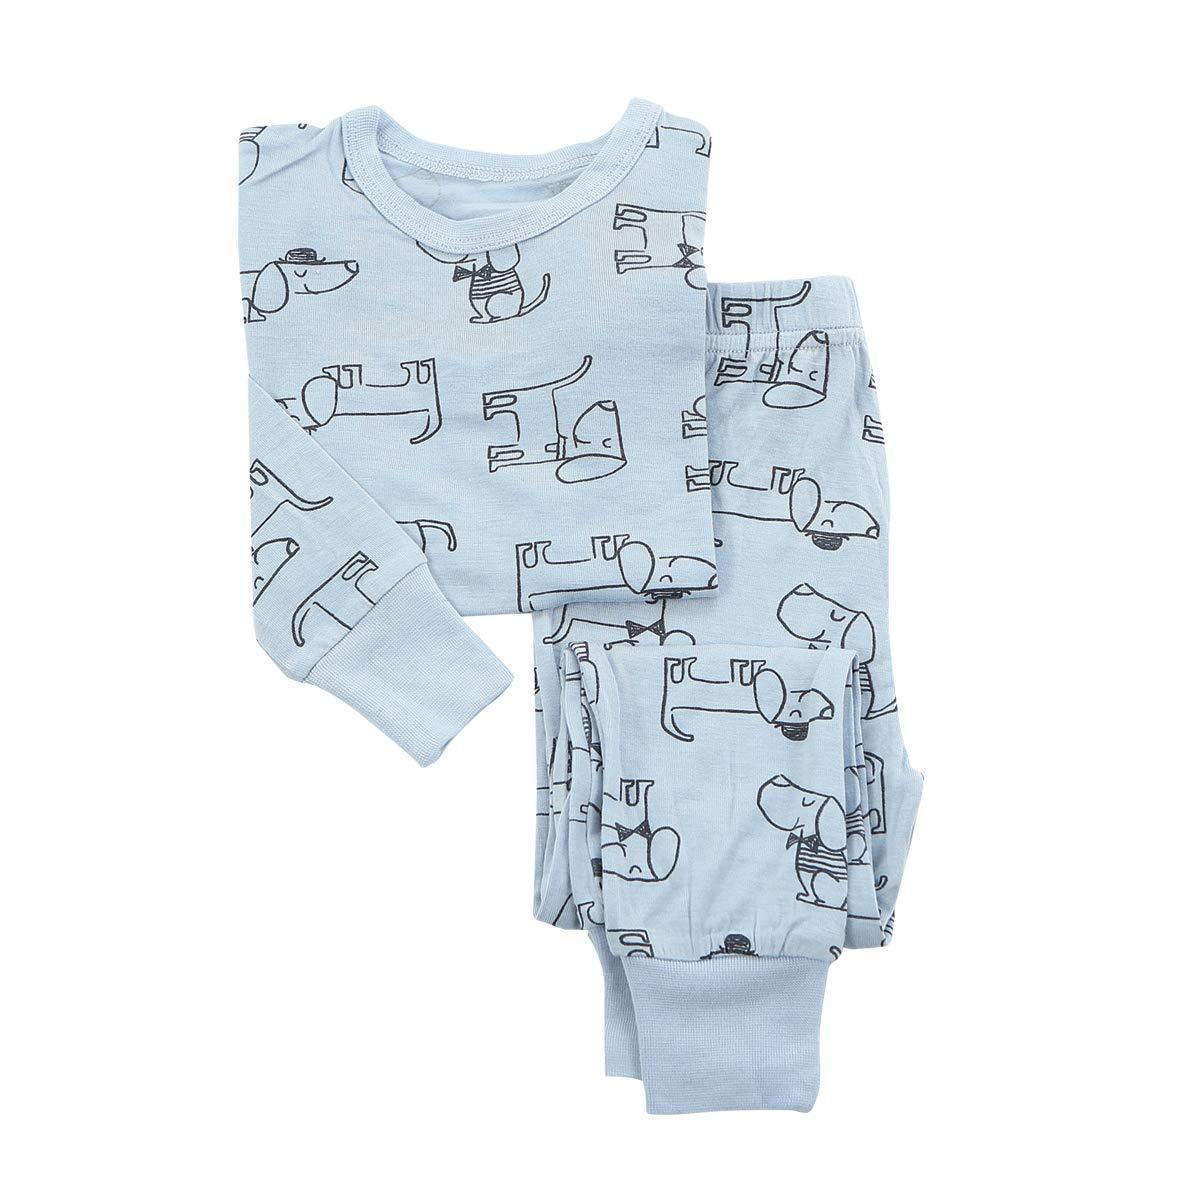 Silkberry Baby Bamboo Pajama Set (Boy & Unisex)